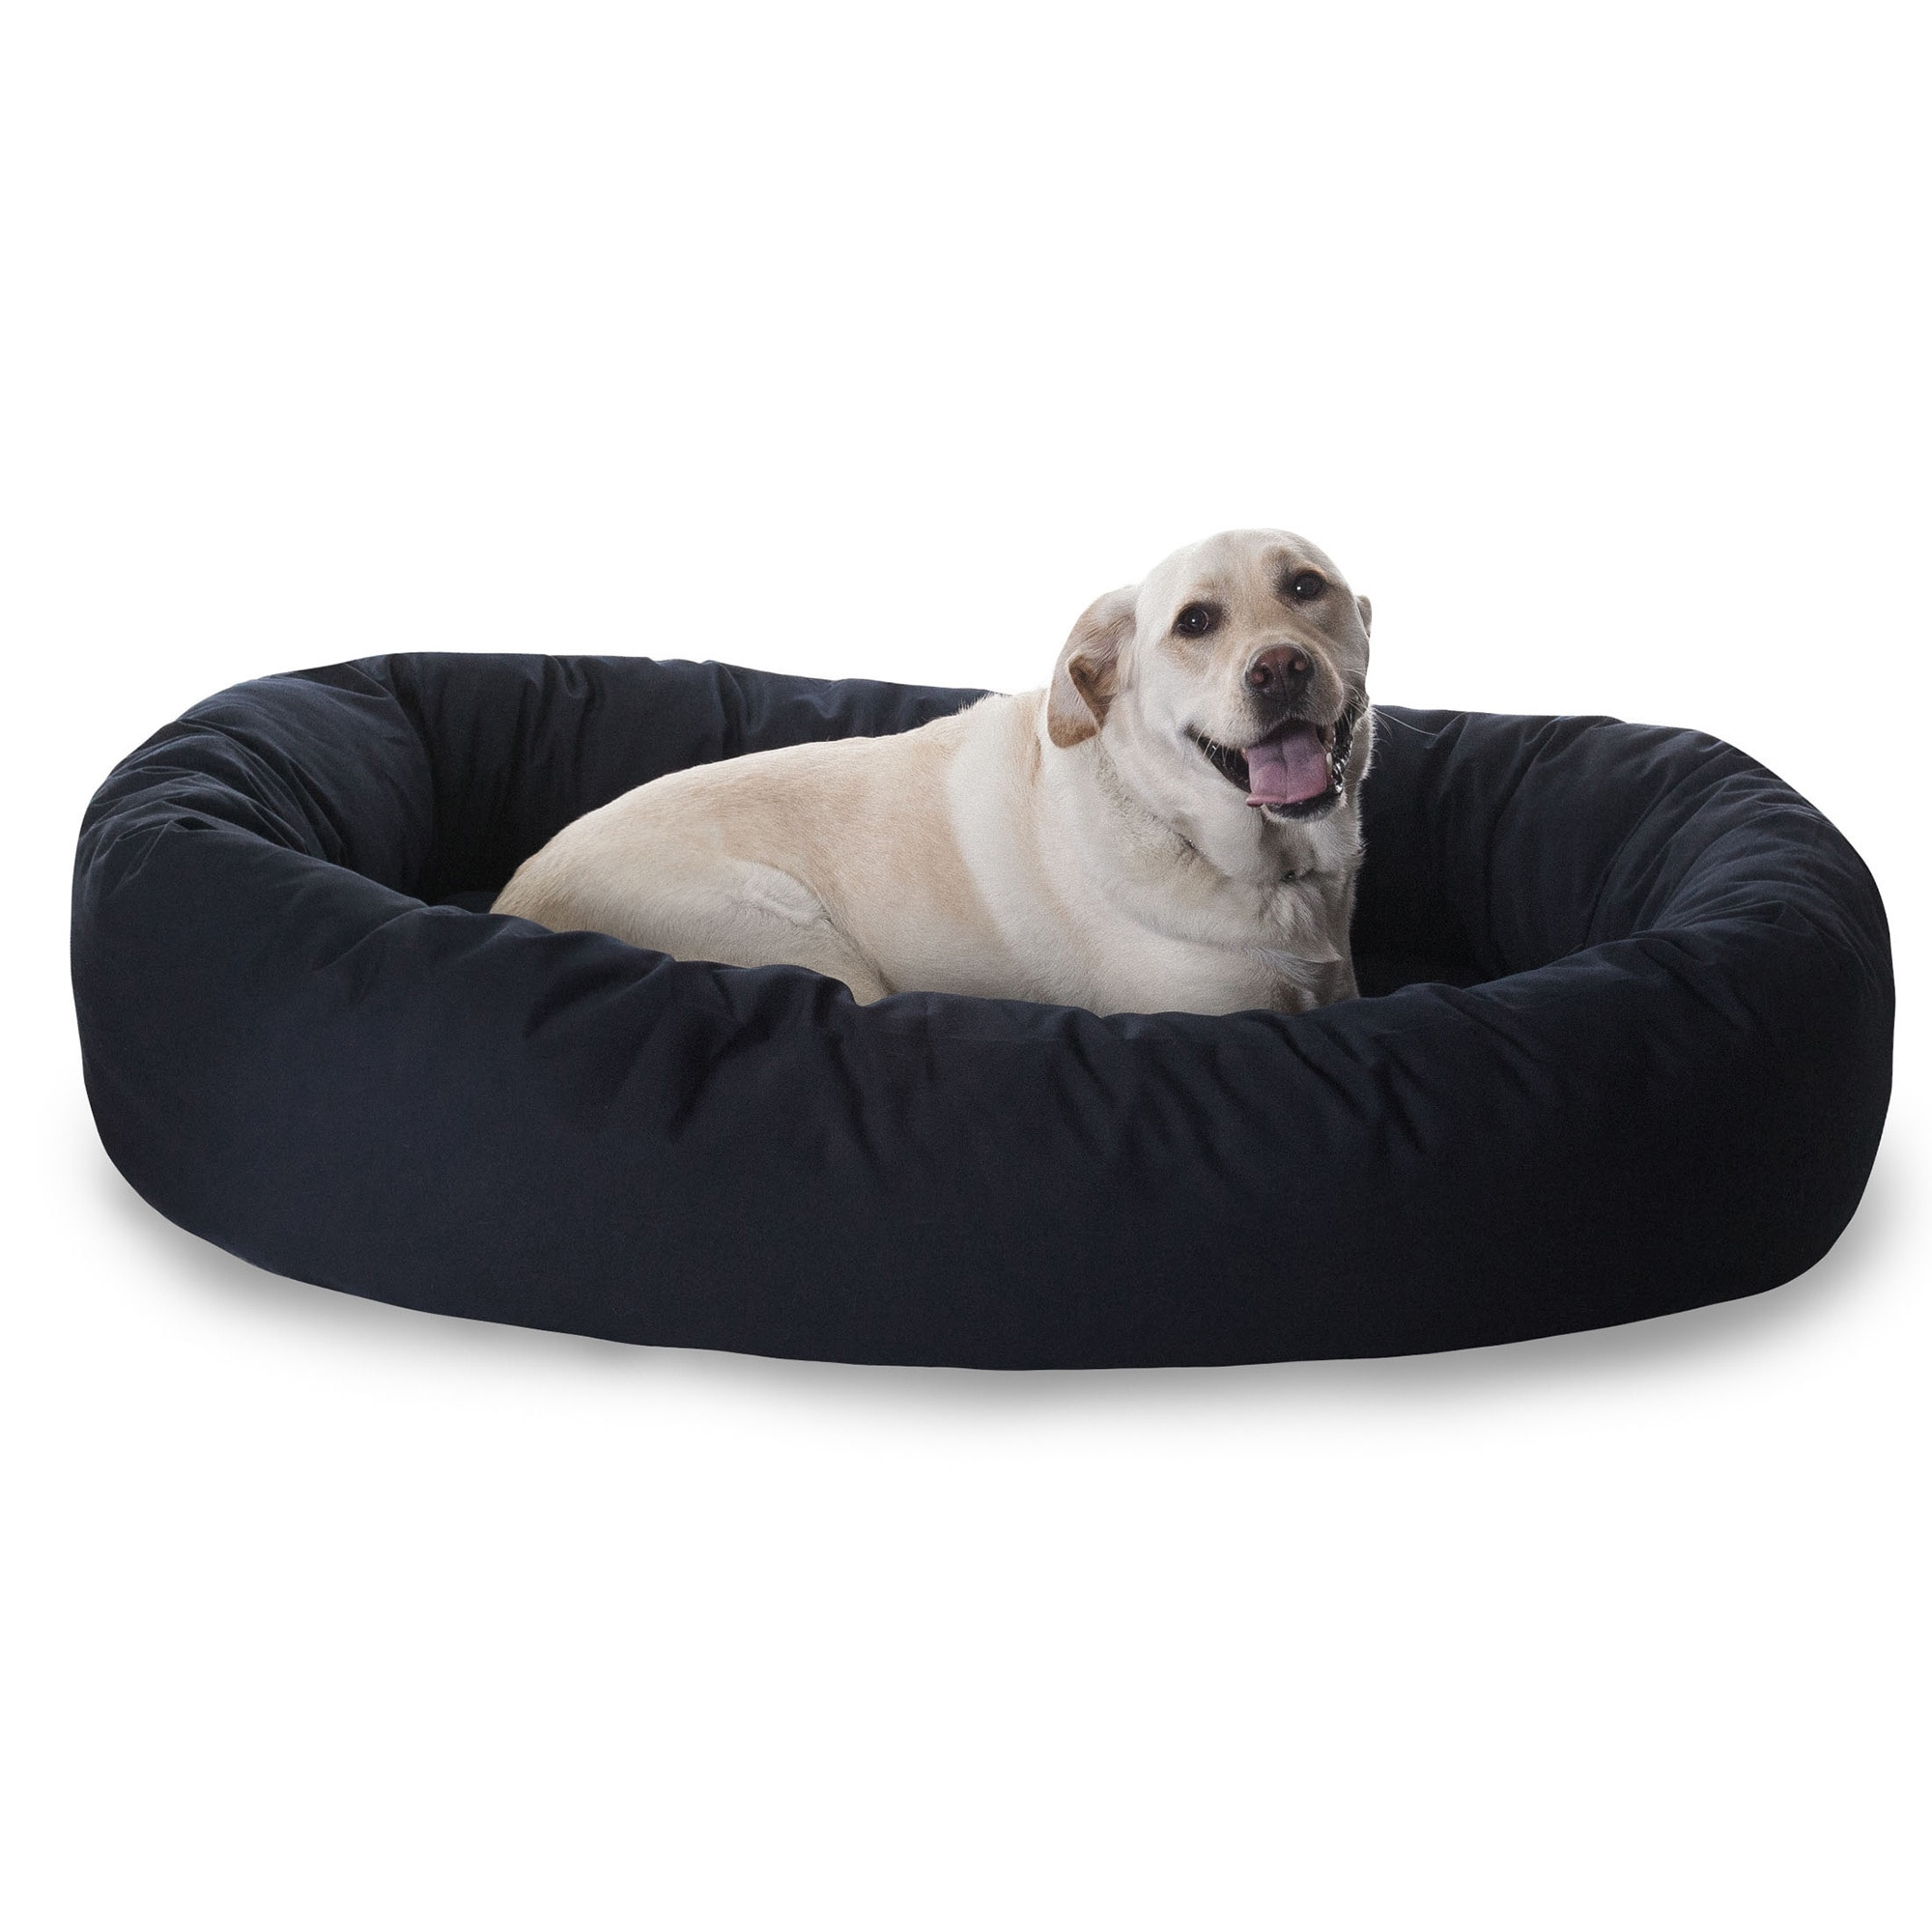 Majestic Pet Luxurious Bagel Style Donut Plush Pet Dog Be...